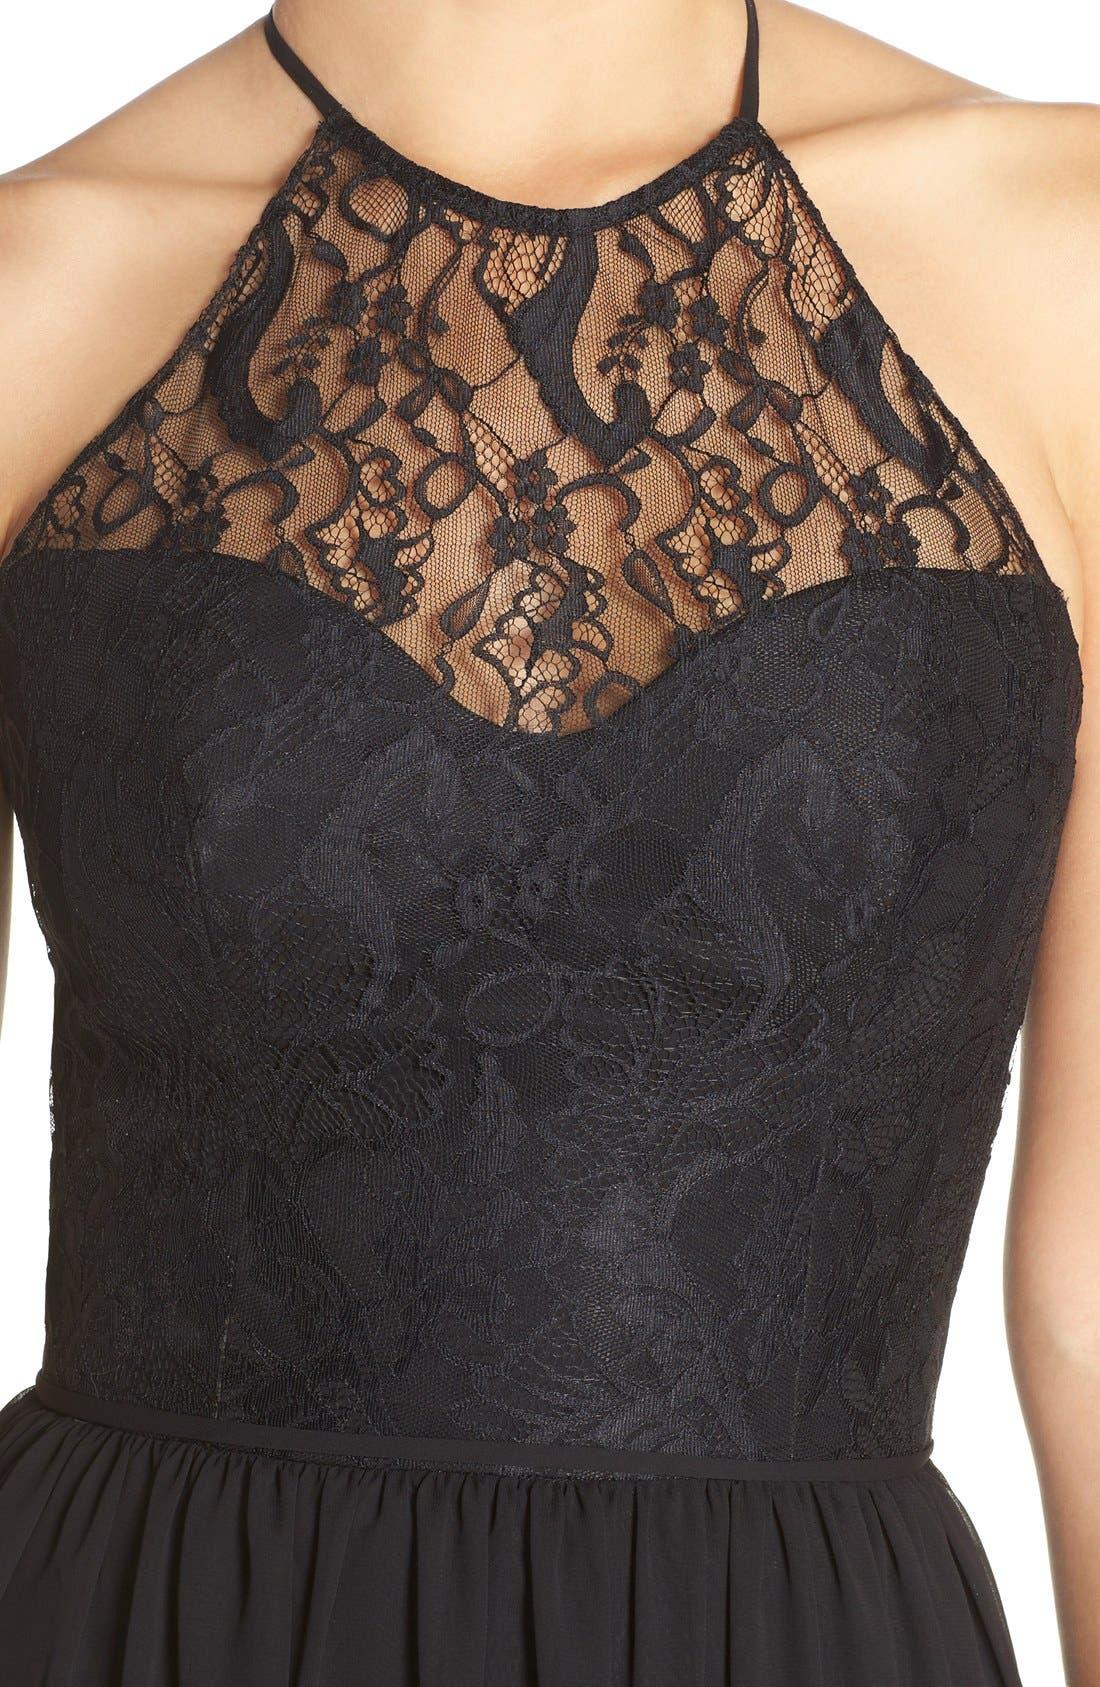 Lace & Chiffon Halter Gown,                             Alternate thumbnail 2, color,                             001